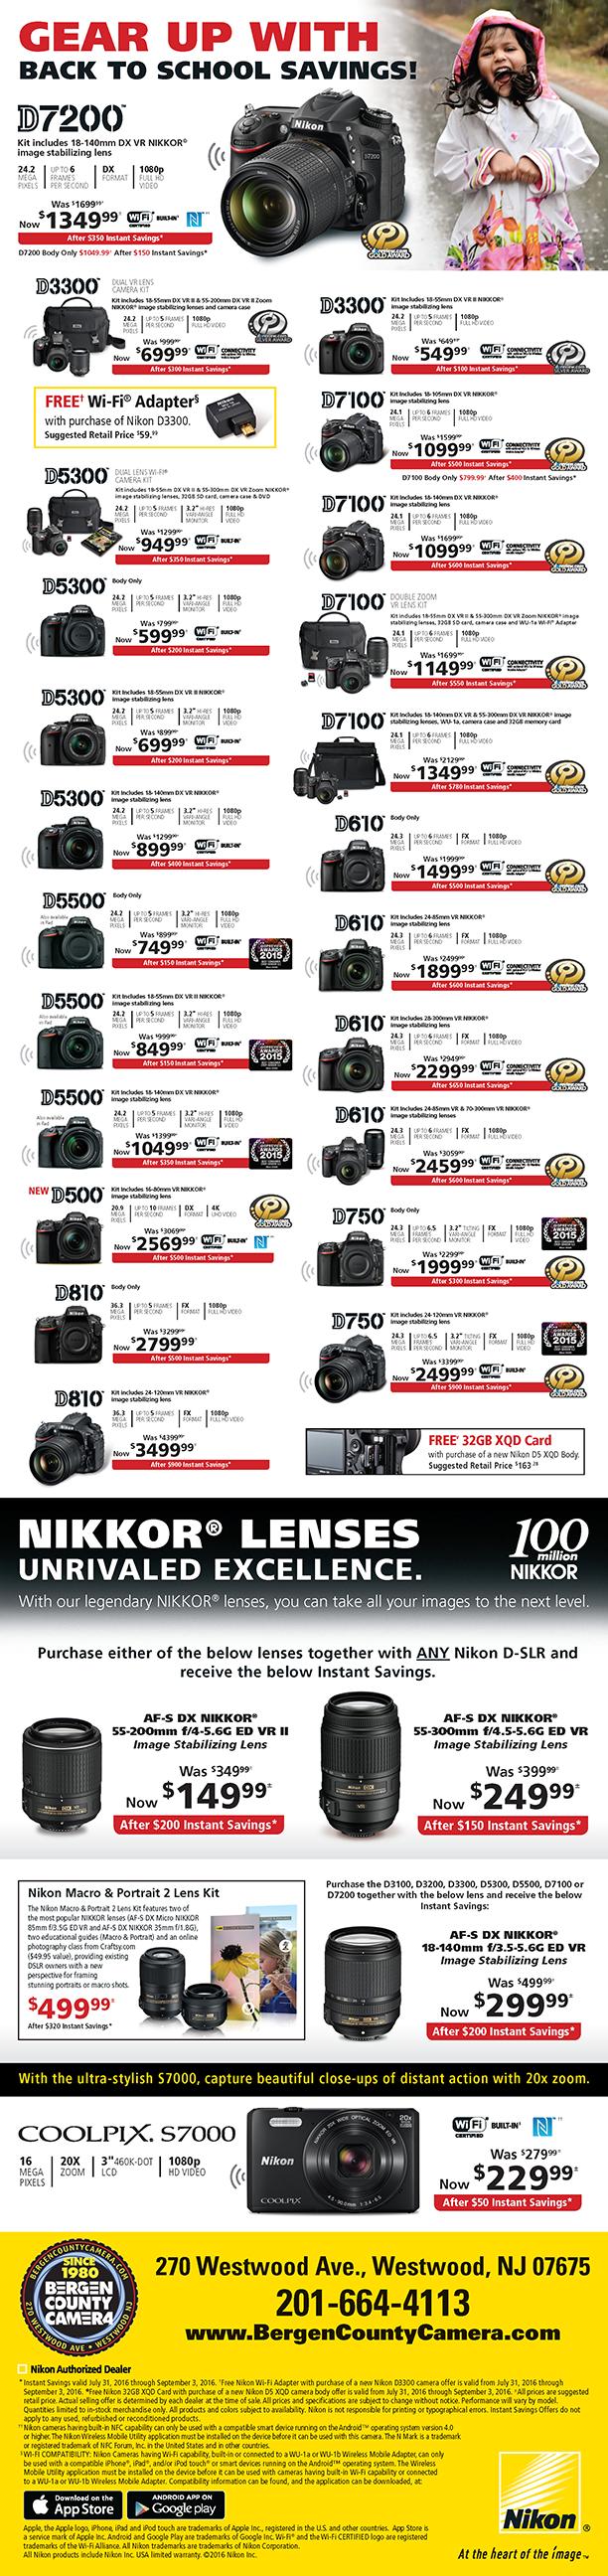 Nikon-blog-Aug21-27